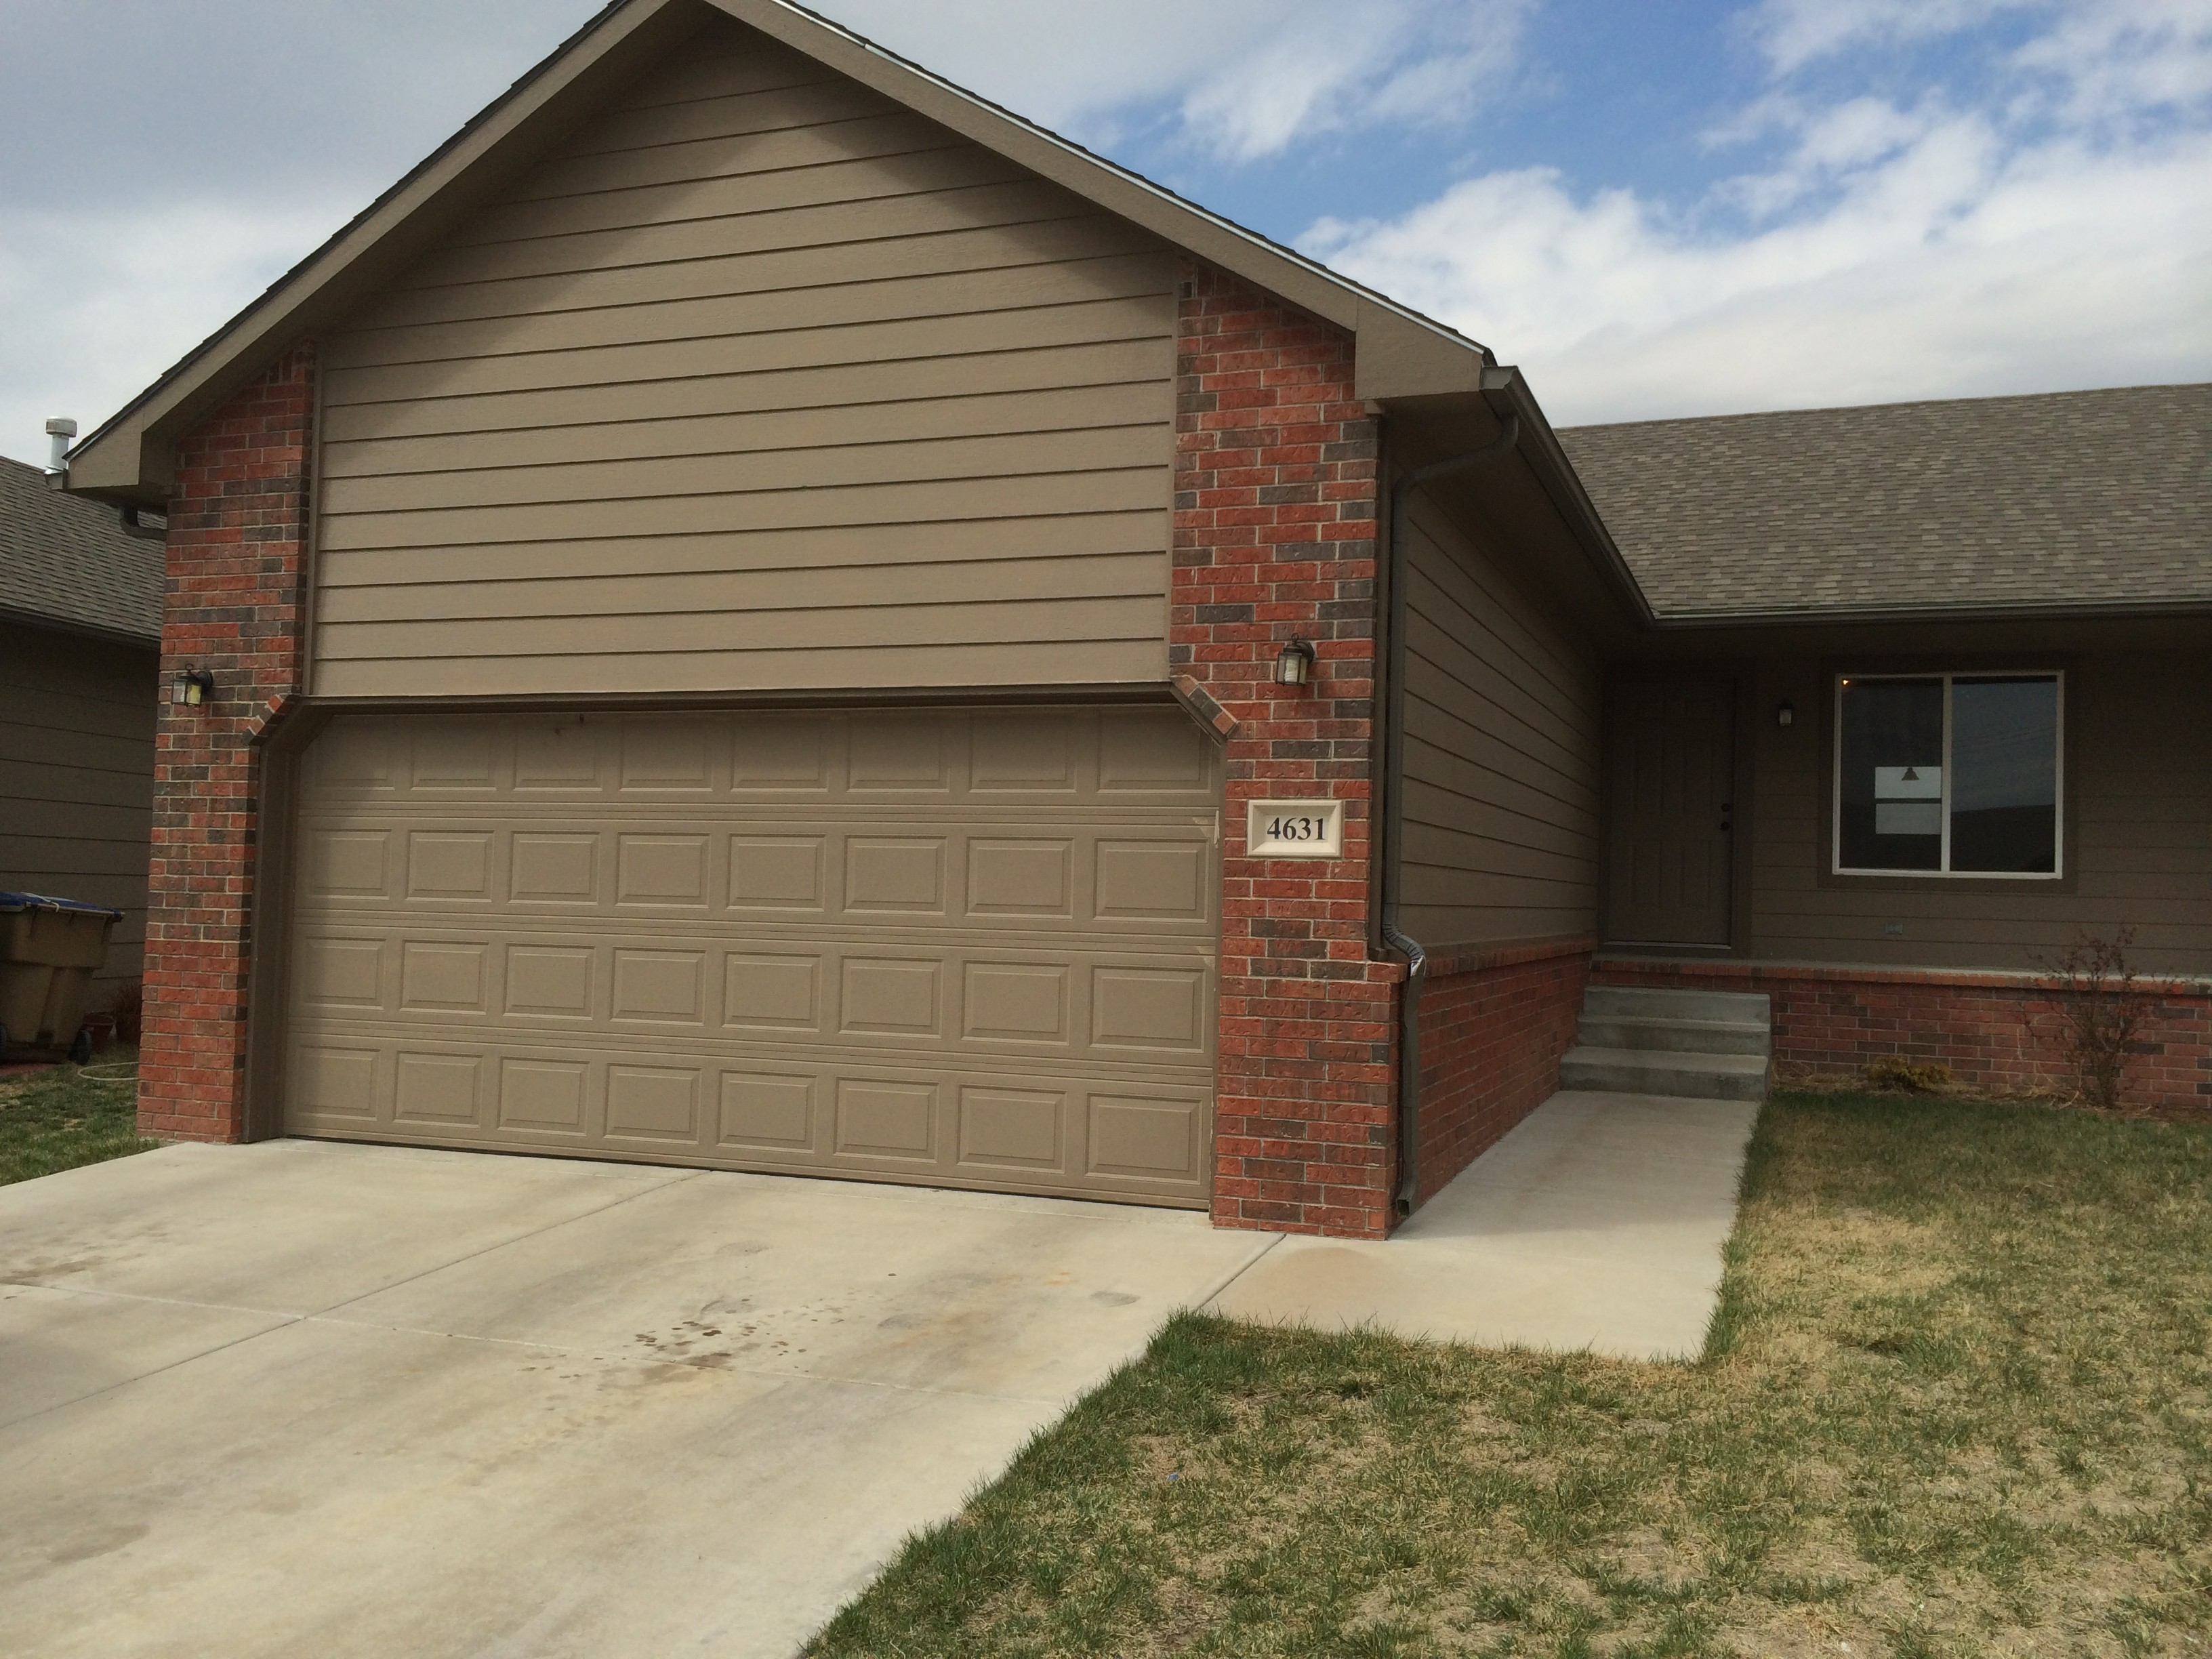 4631 N Ironwood Cir Wichita Ks 67226 4 Bedroom Apartment For Rent For 1 295 Month Zumper